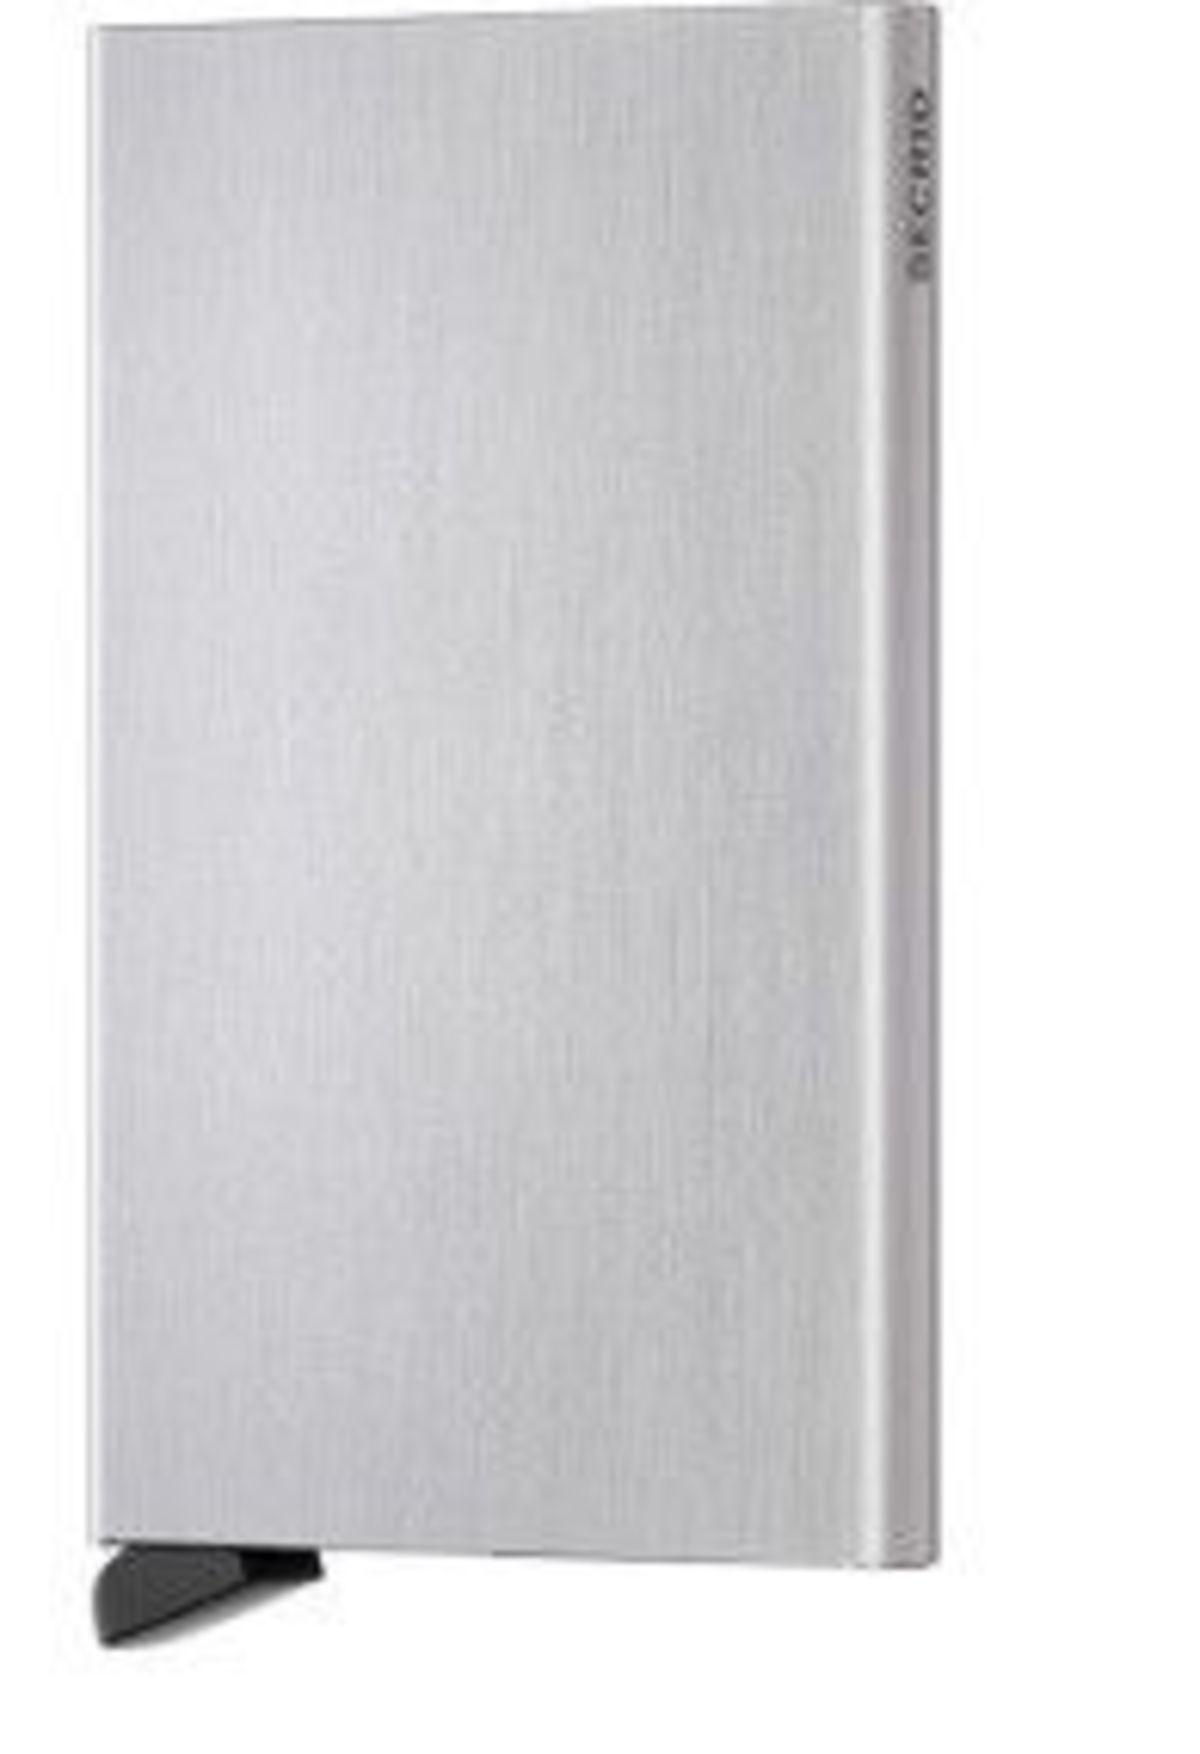 Secrid Cardprotector Brushed Silver Garmentory